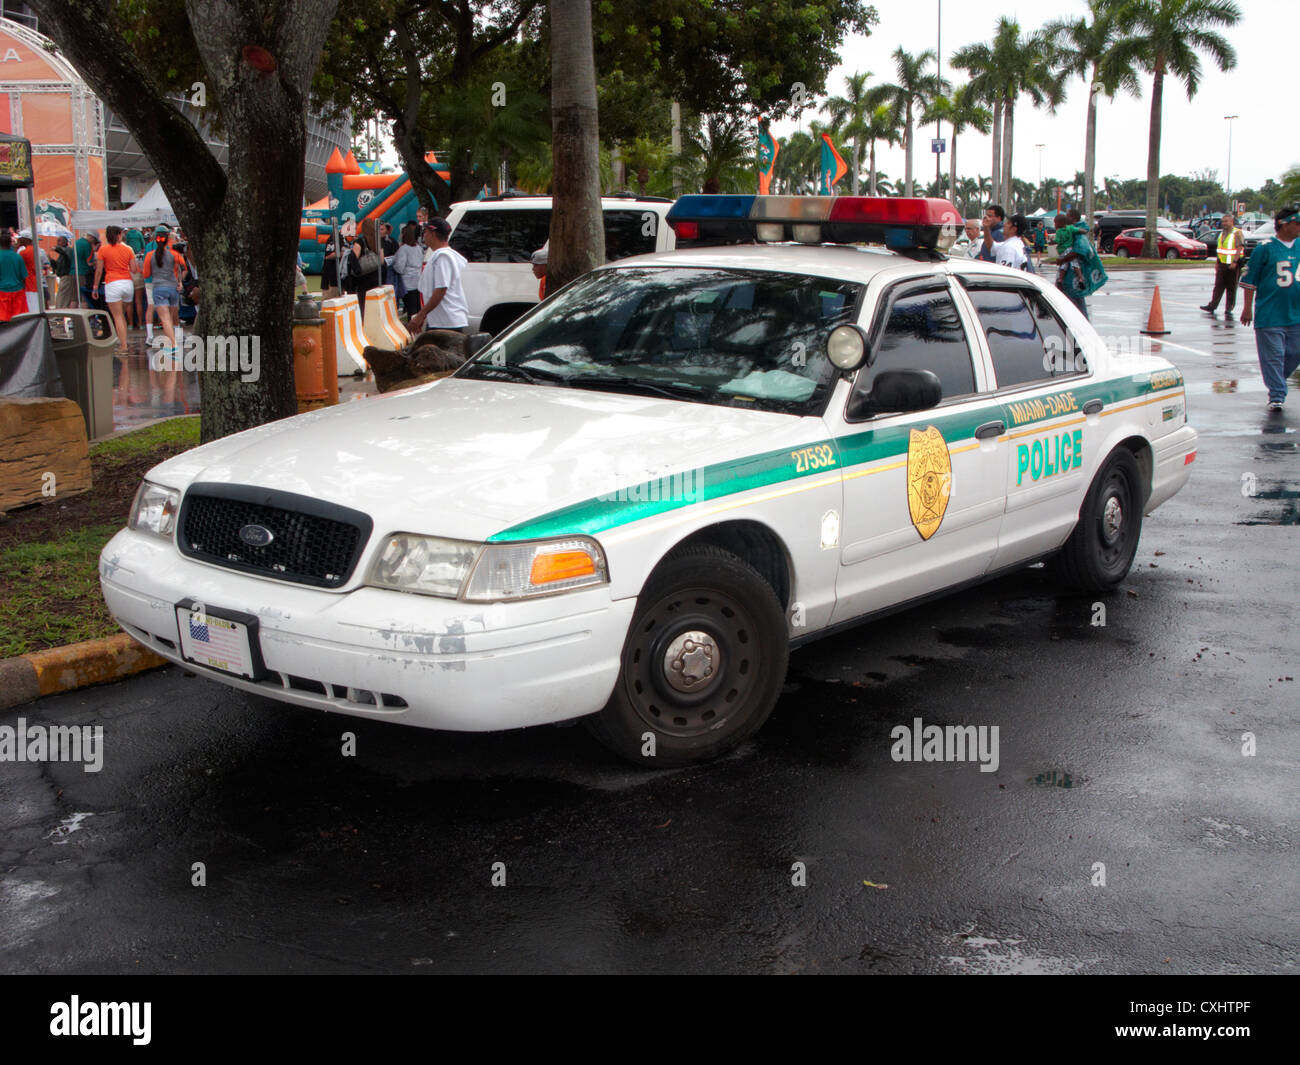 miami dade police patrol car at sun life stadium Miami Florida usa - Stock Image